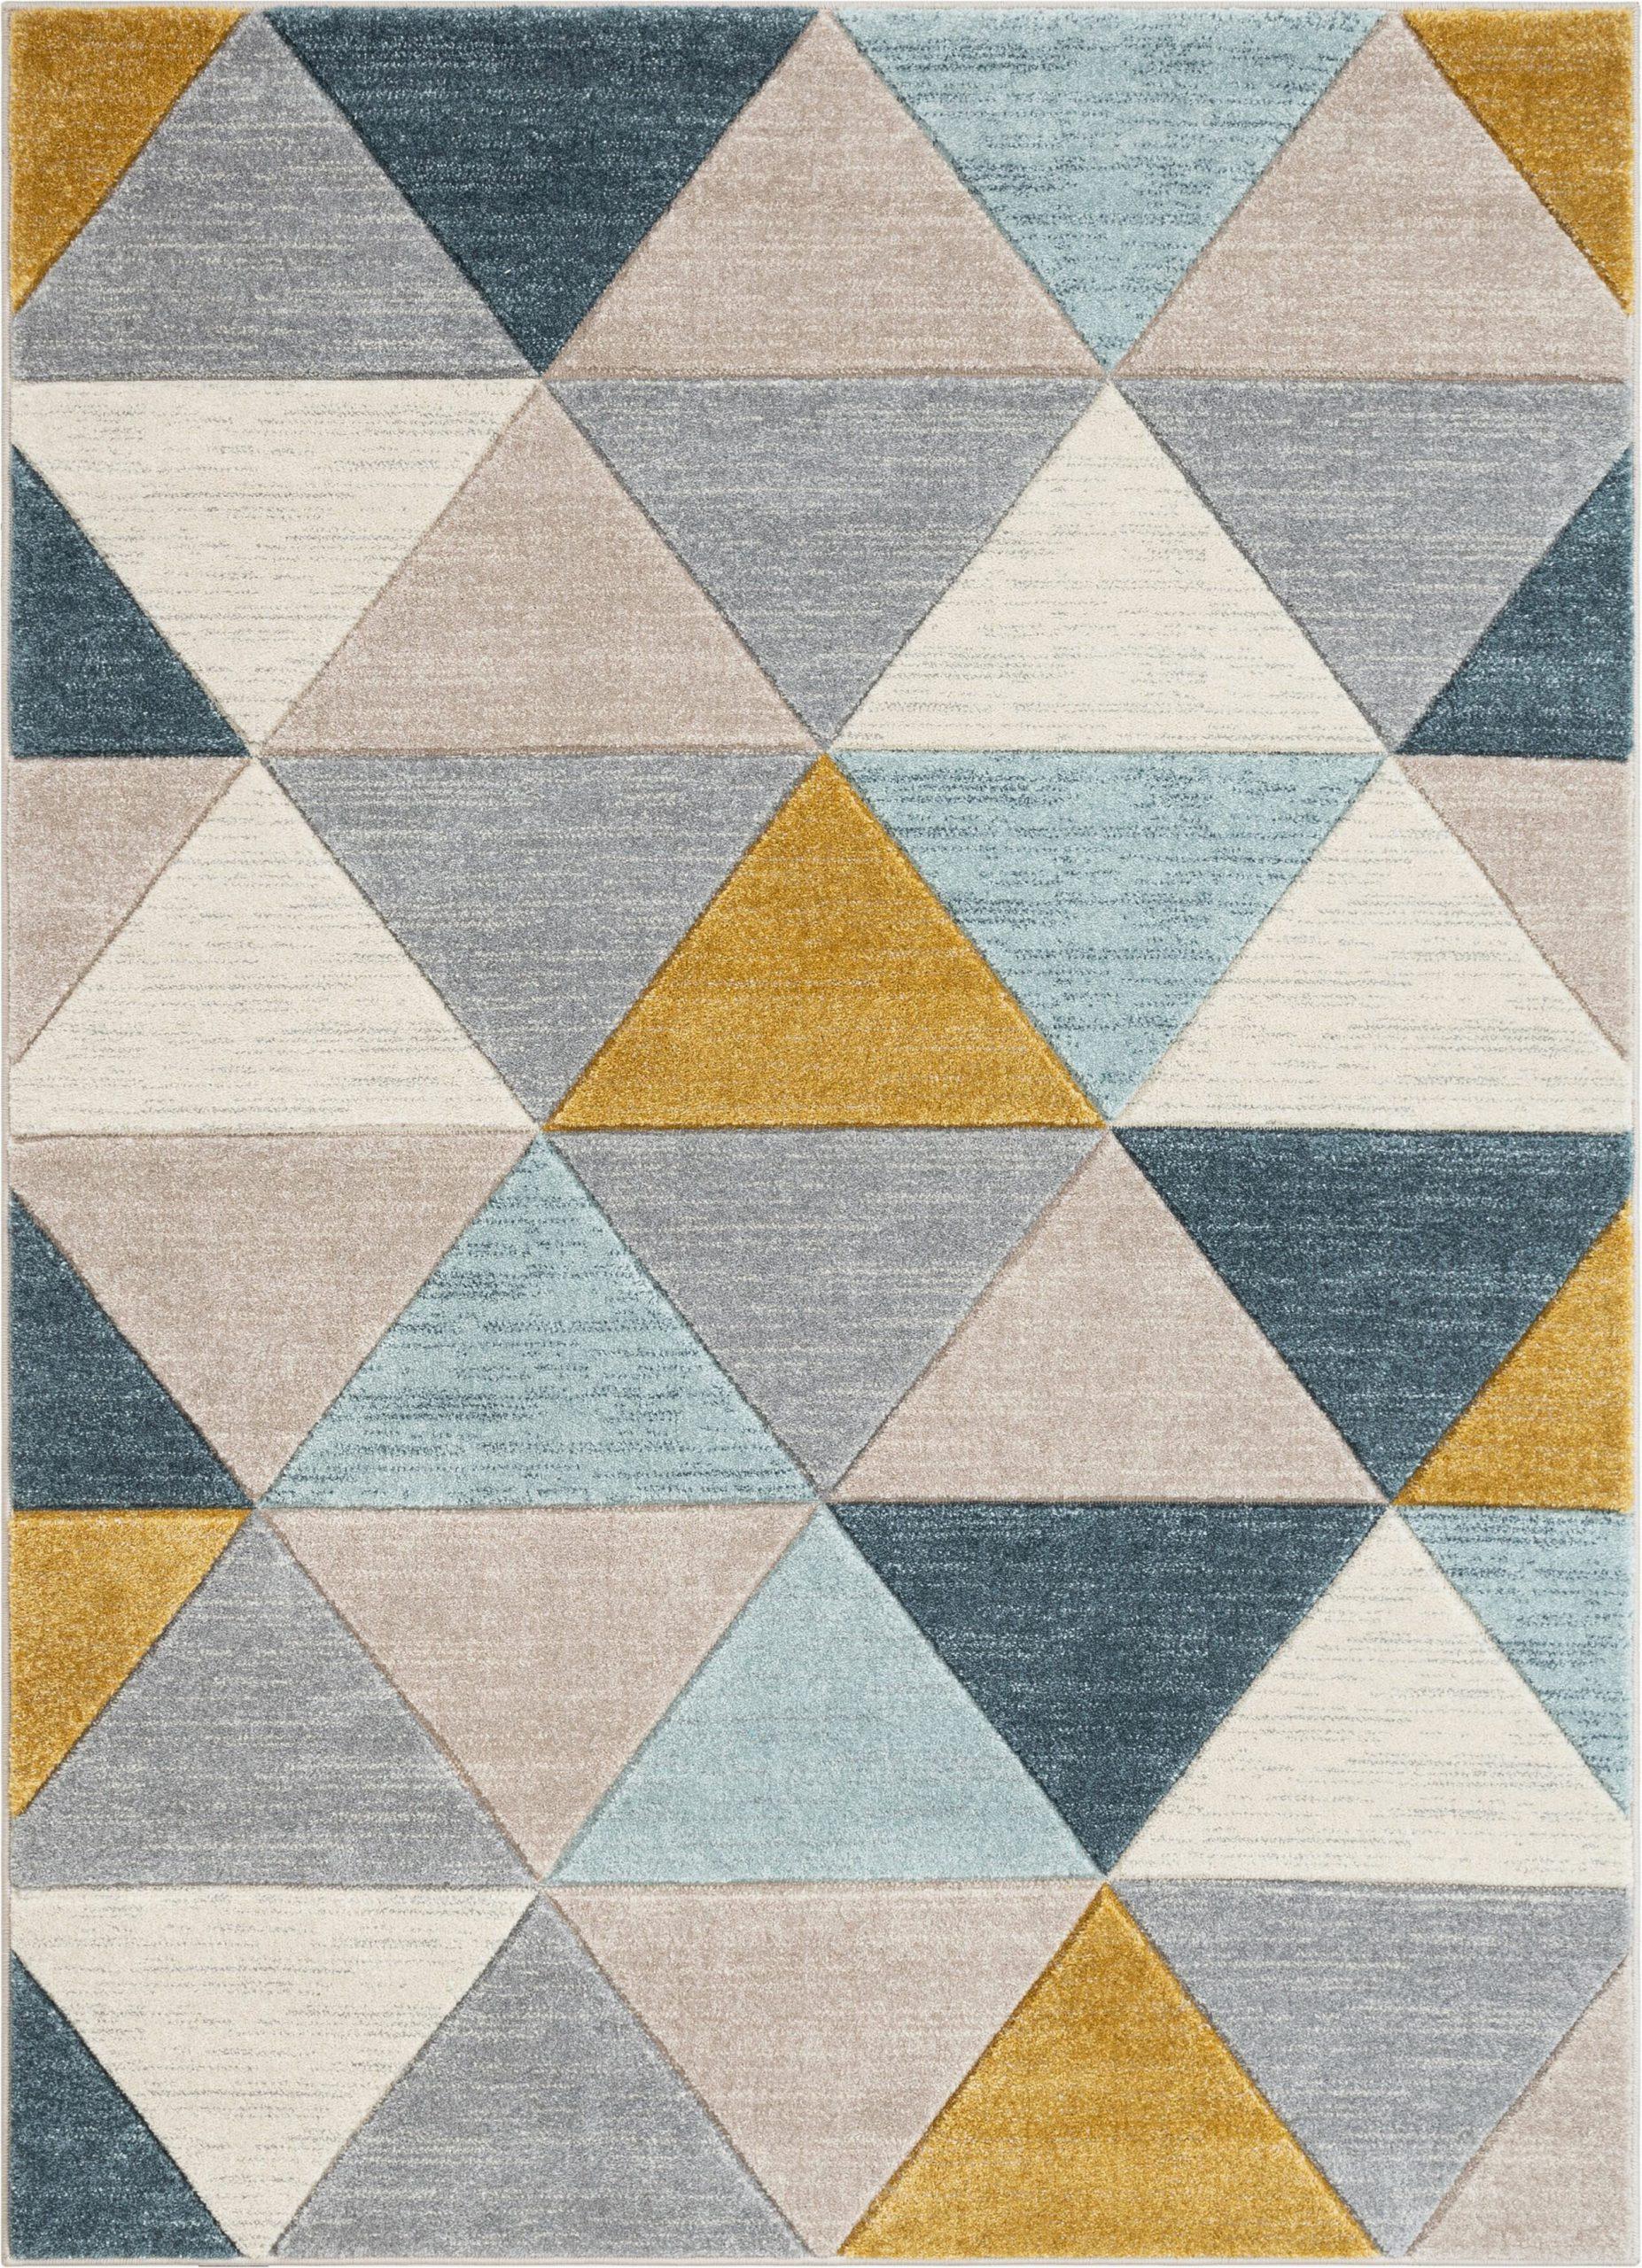 ruby rita mid century modern geometric triangles bluemintivory area rug